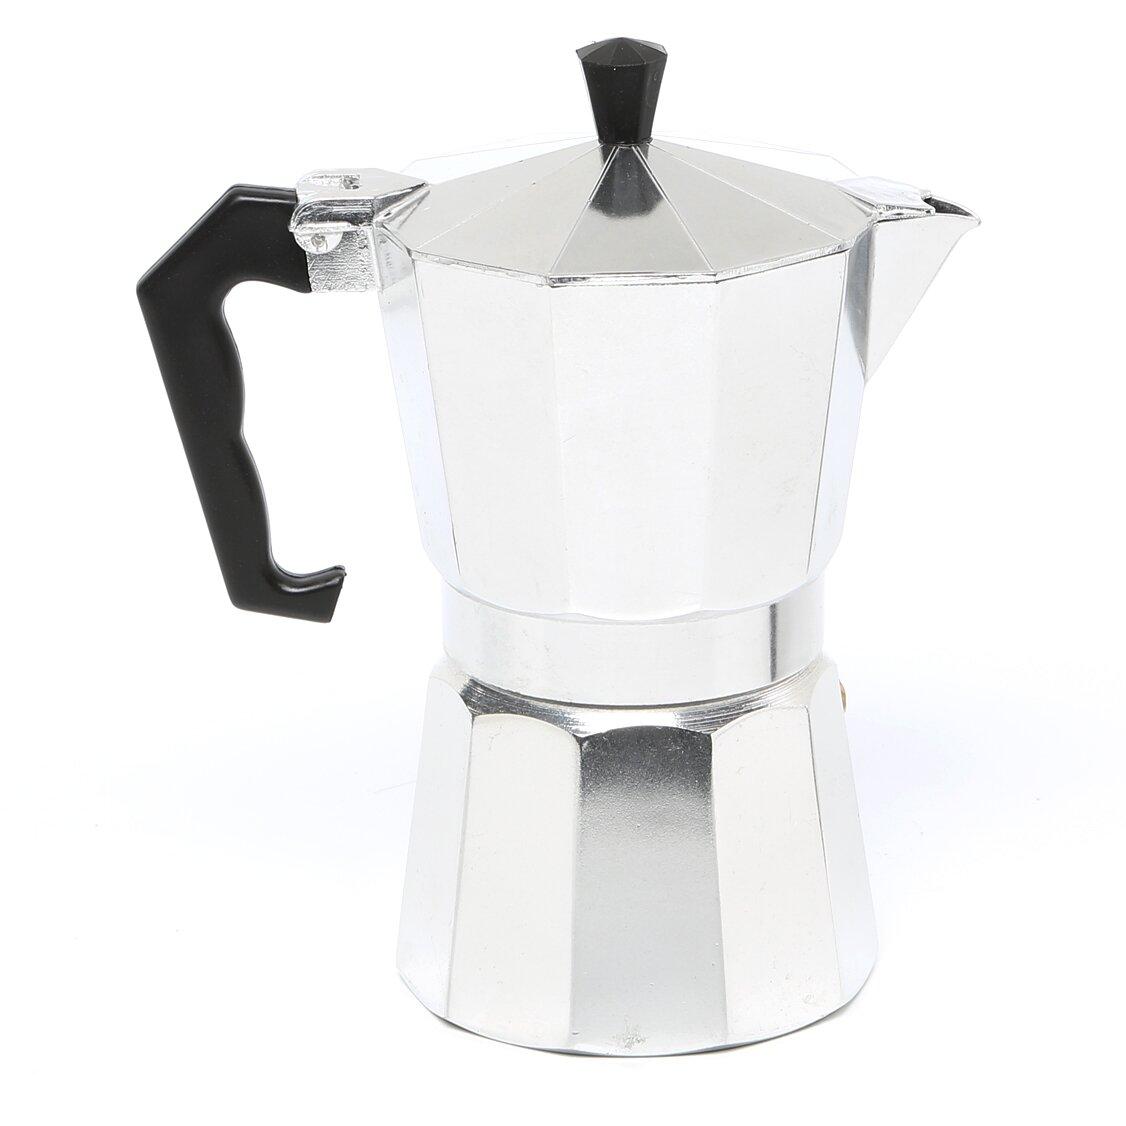 Kitchen Living Coffee Maker Reviews : Bialetti Venus Espresso Maker & Reviews Wayfair